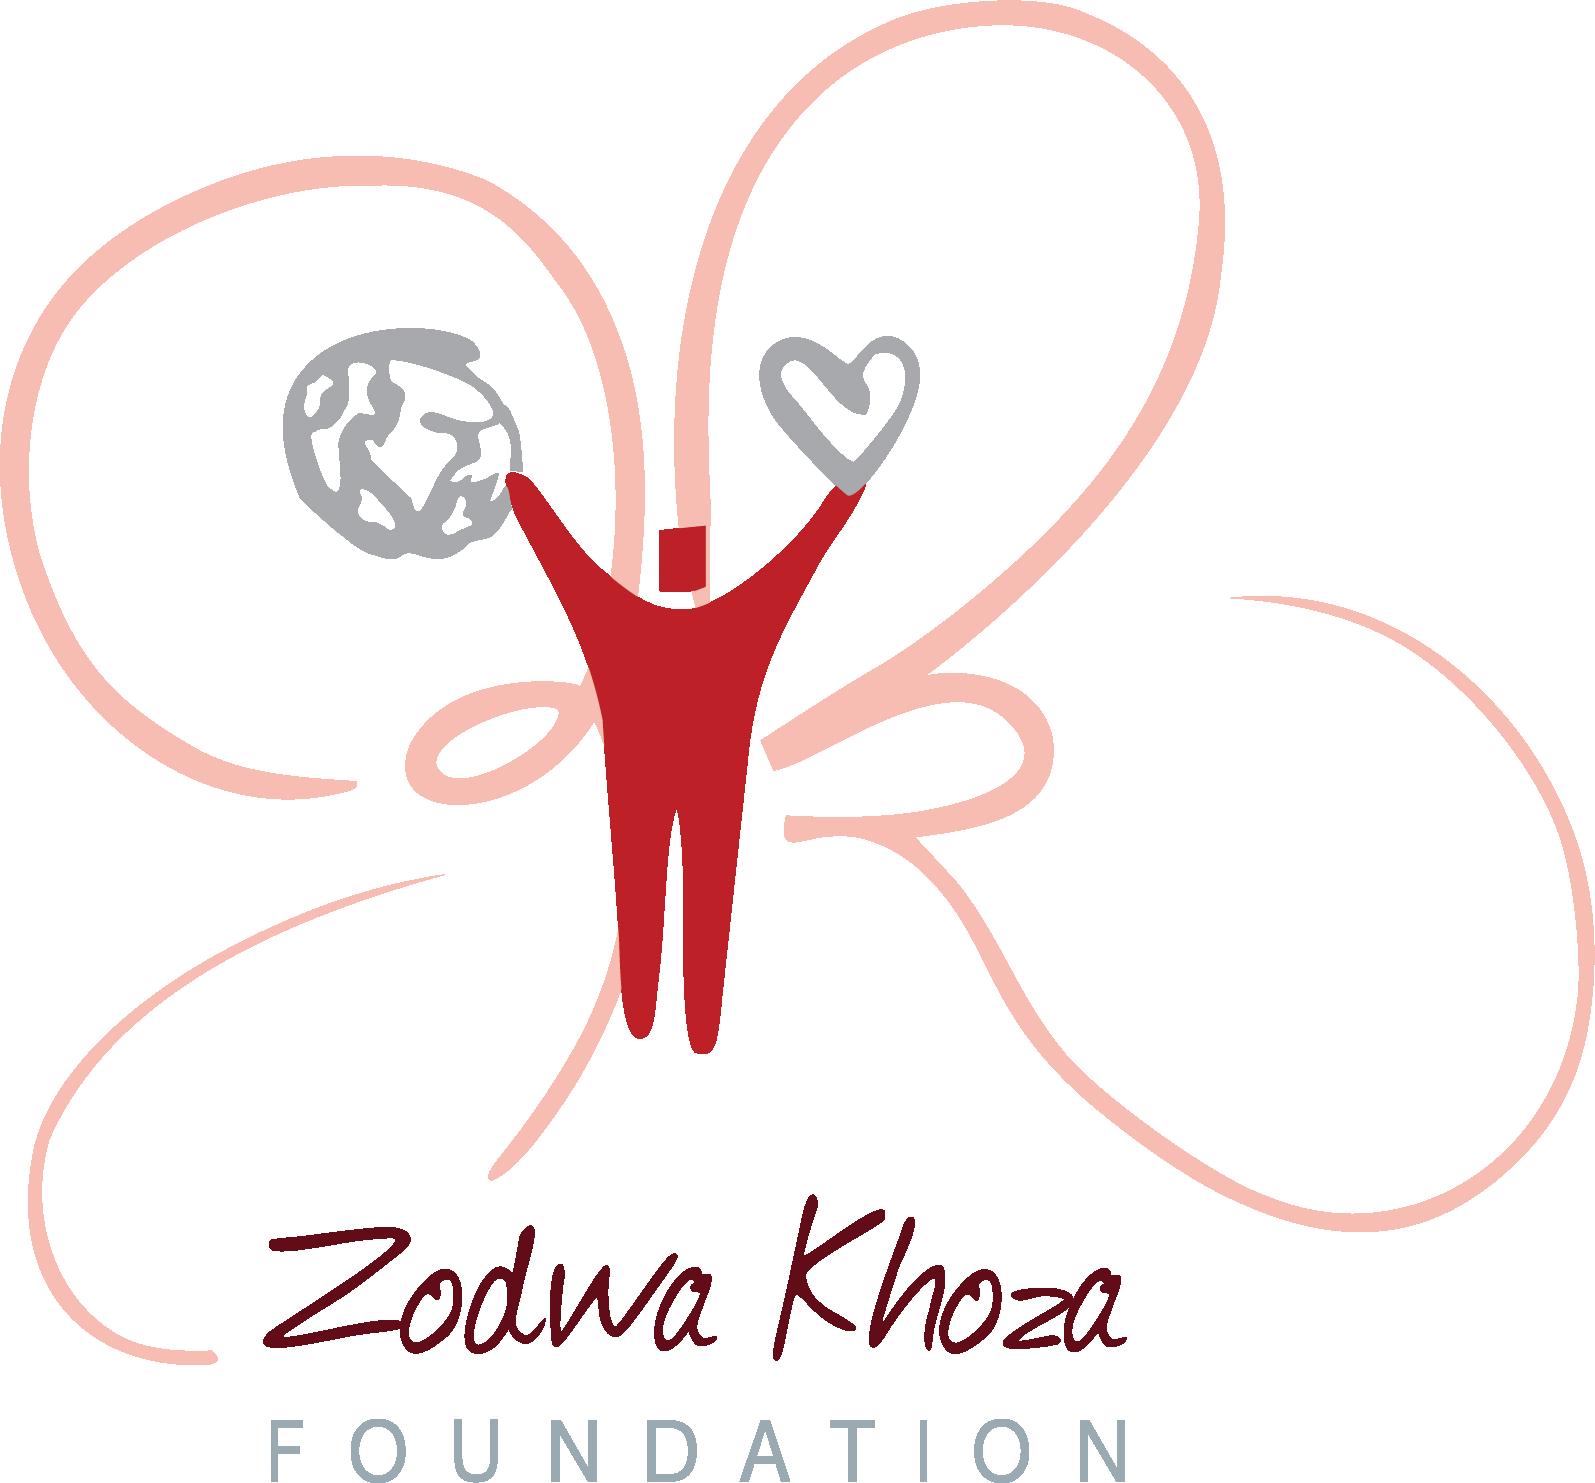 Zodwa Khoza Foundation